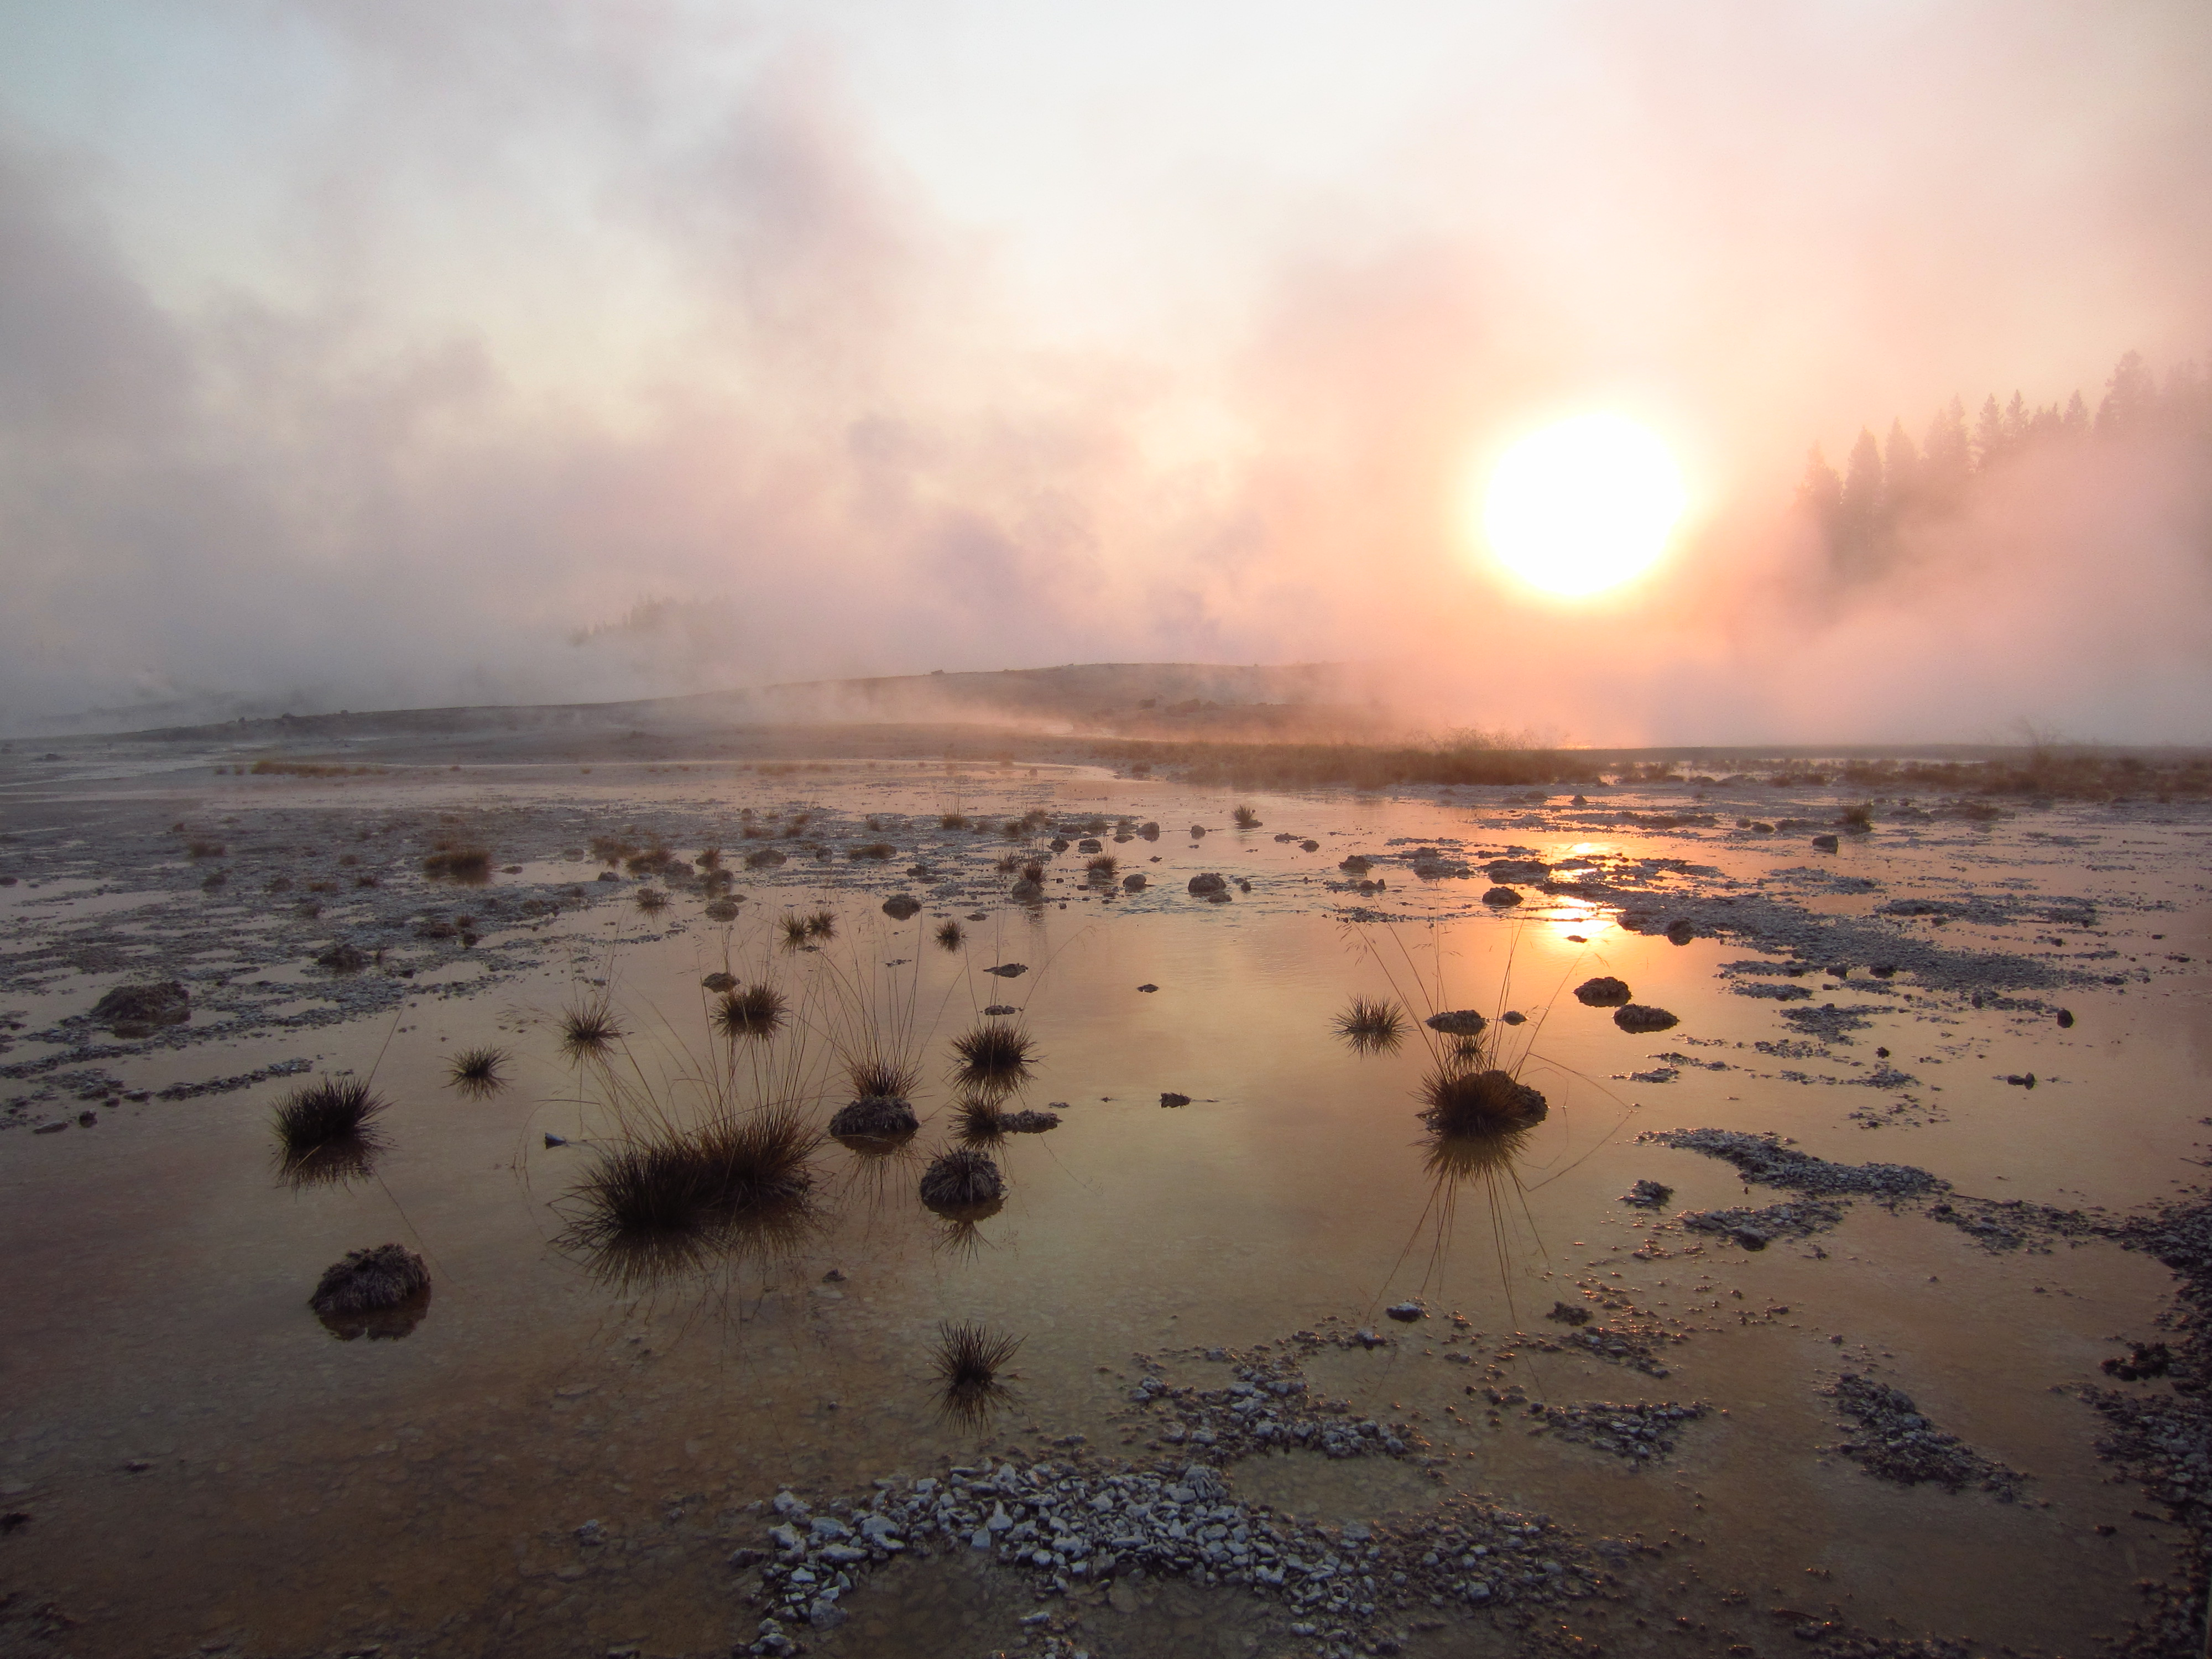 norris geyser basin, wyoming